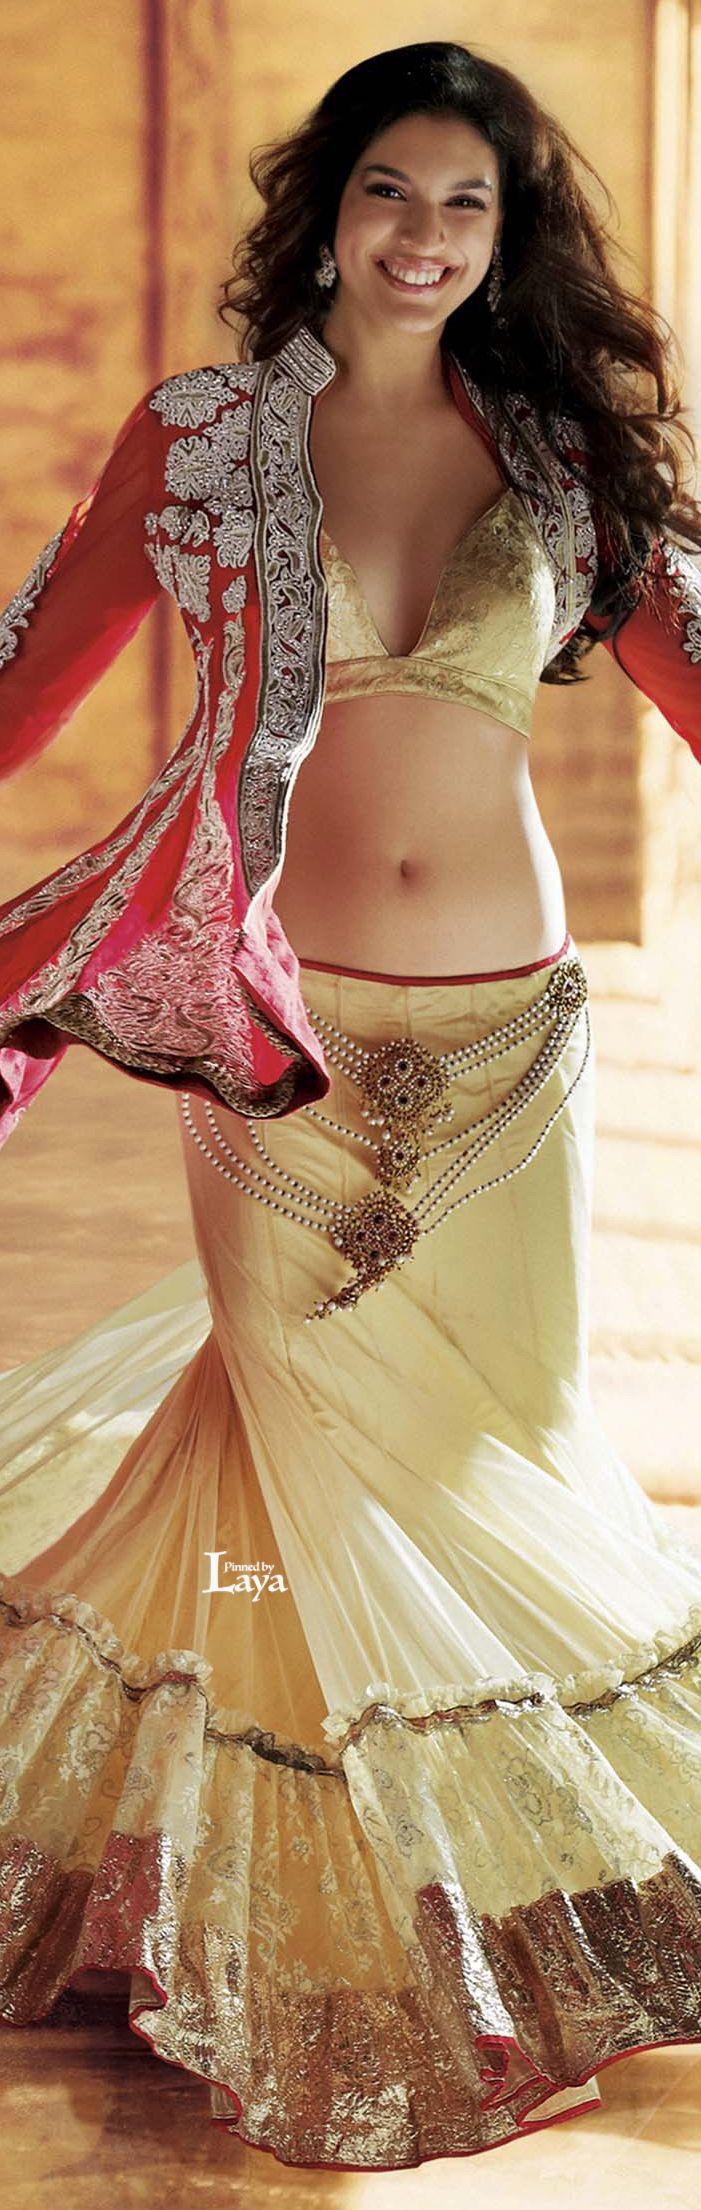 Red and cream lengha choli  #DeshiFashion #OnlineShoppingMall #DeliveringTrust